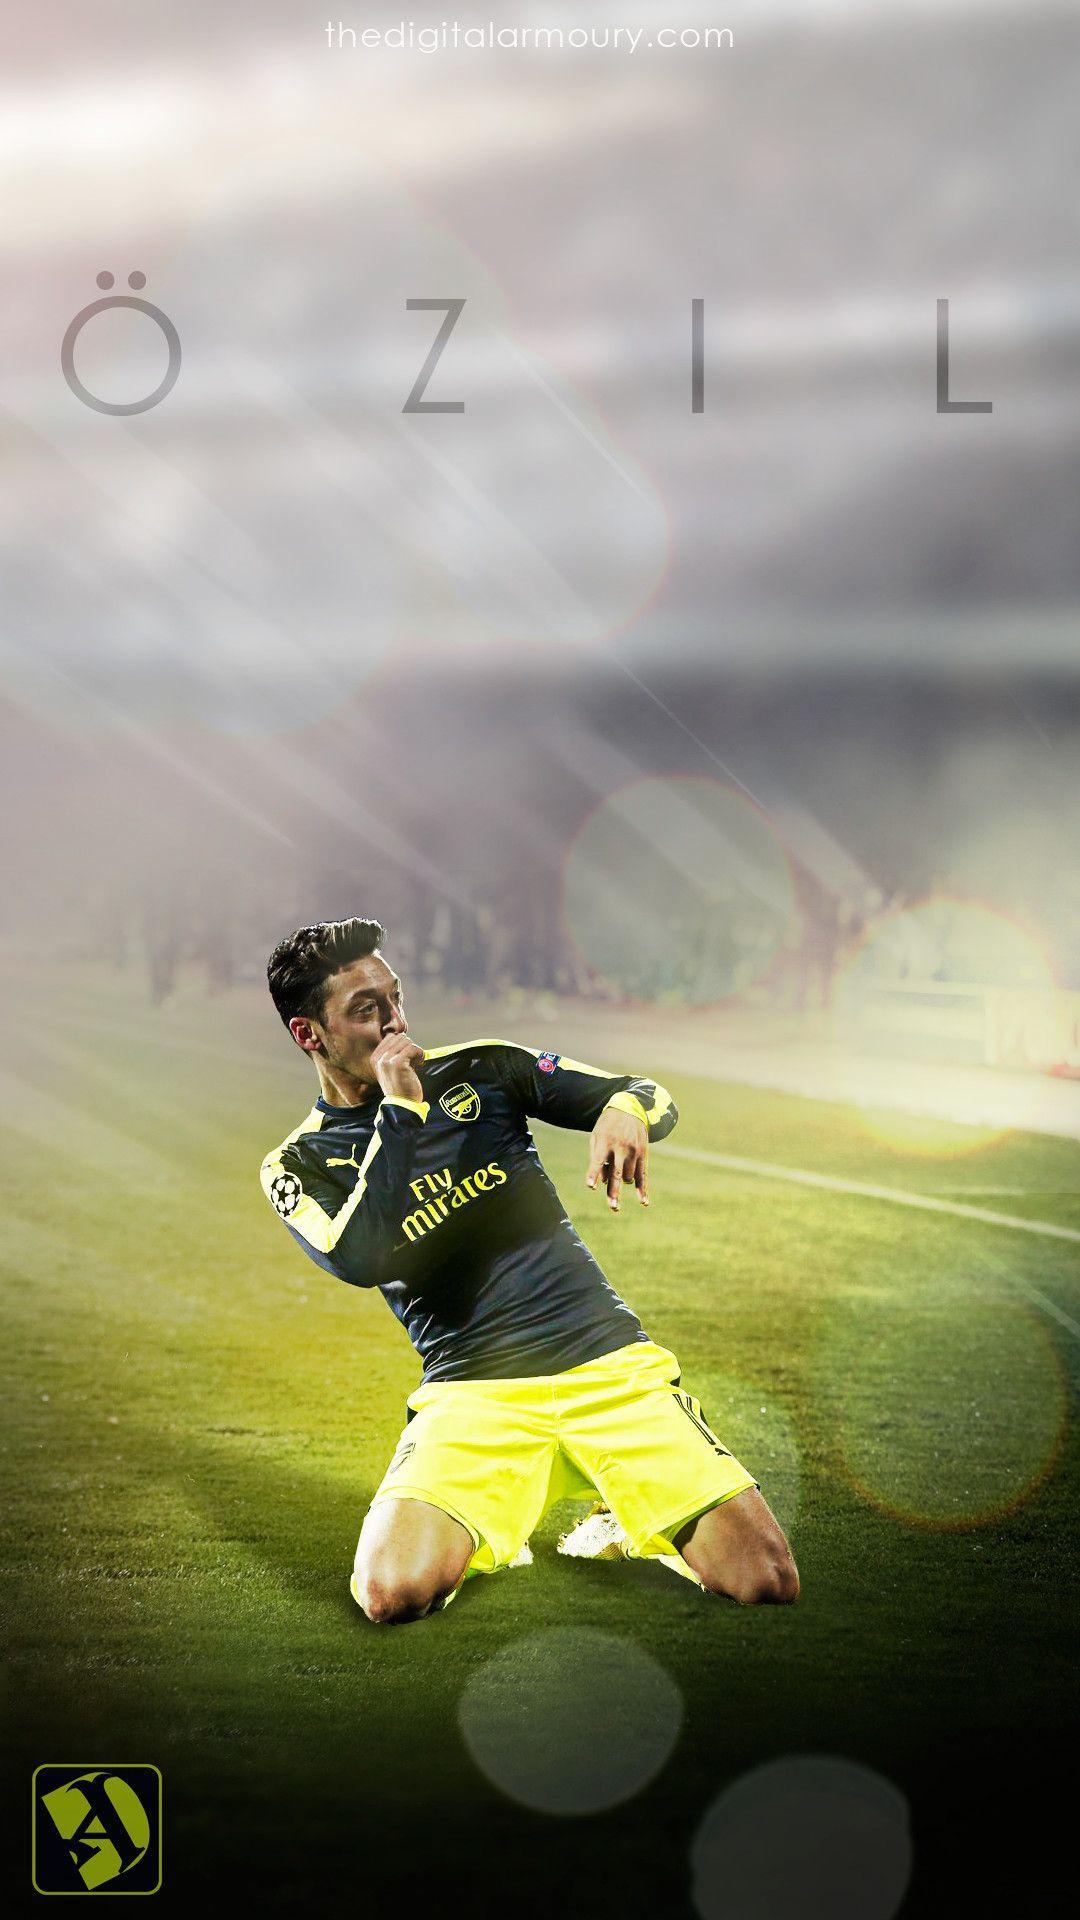 Mesut Özil 2018 Wallpapers - Wallpaper Cave